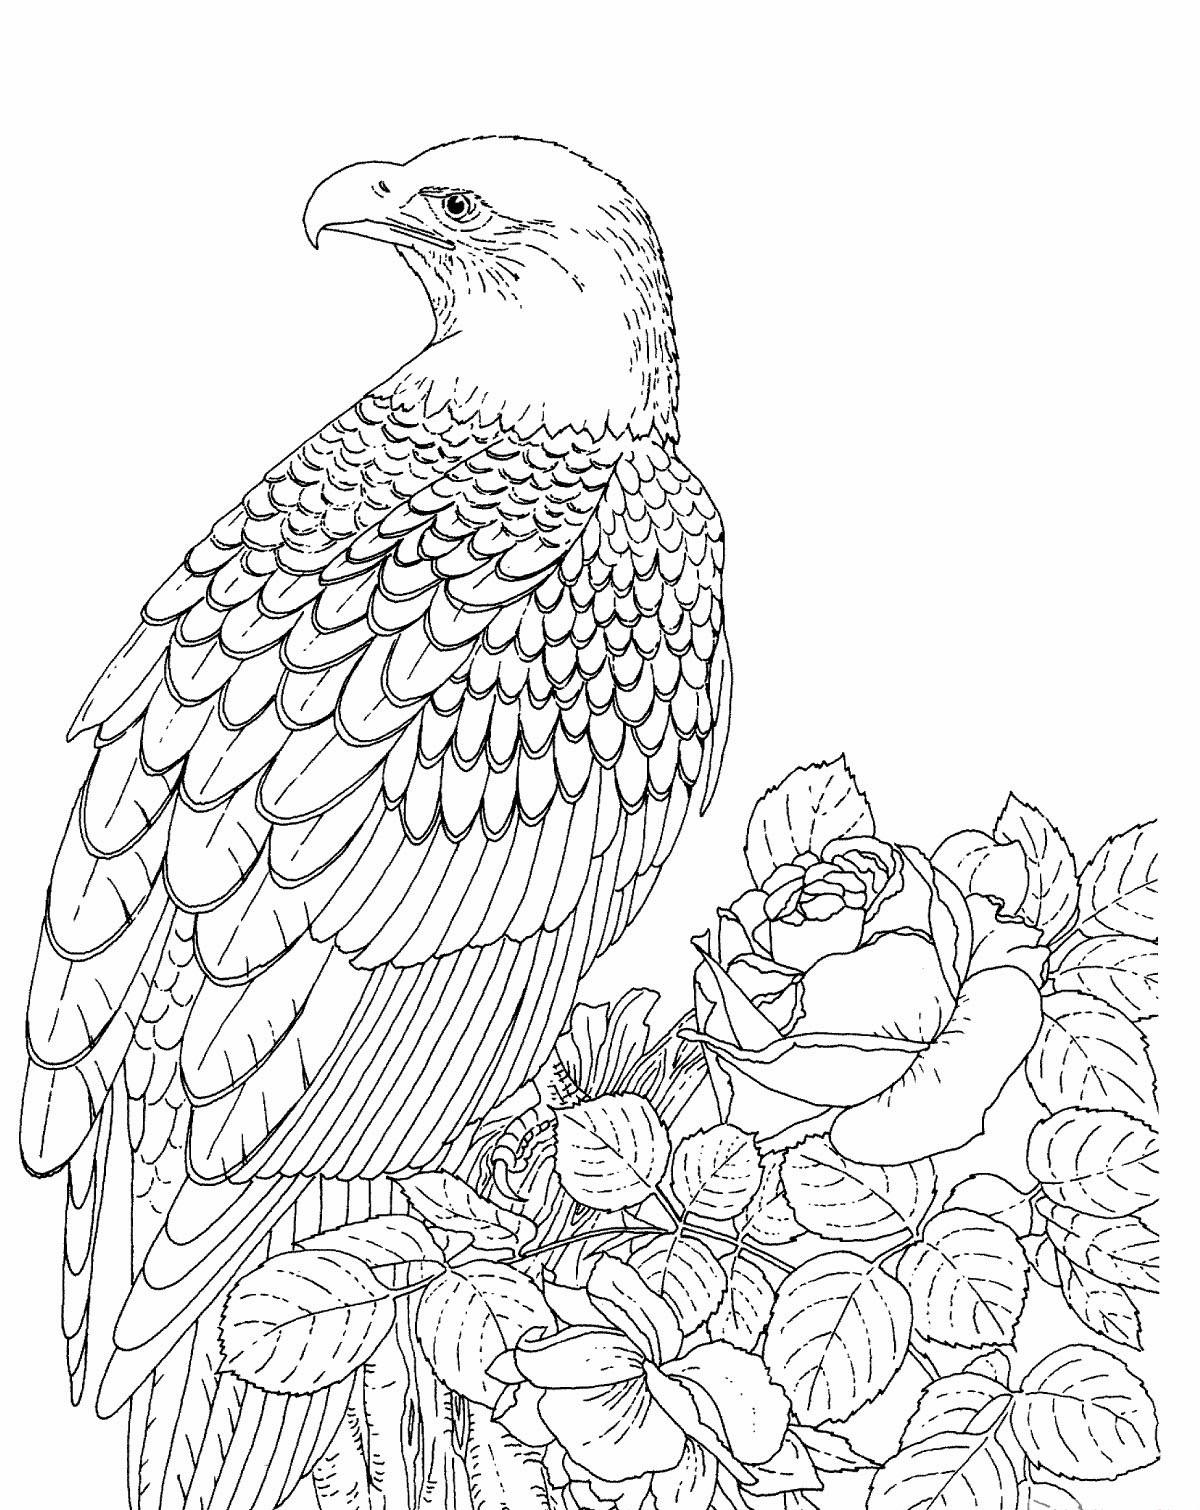 bald eagle coloring page free printable bald eagle coloring pages for kids coloring bald eagle page